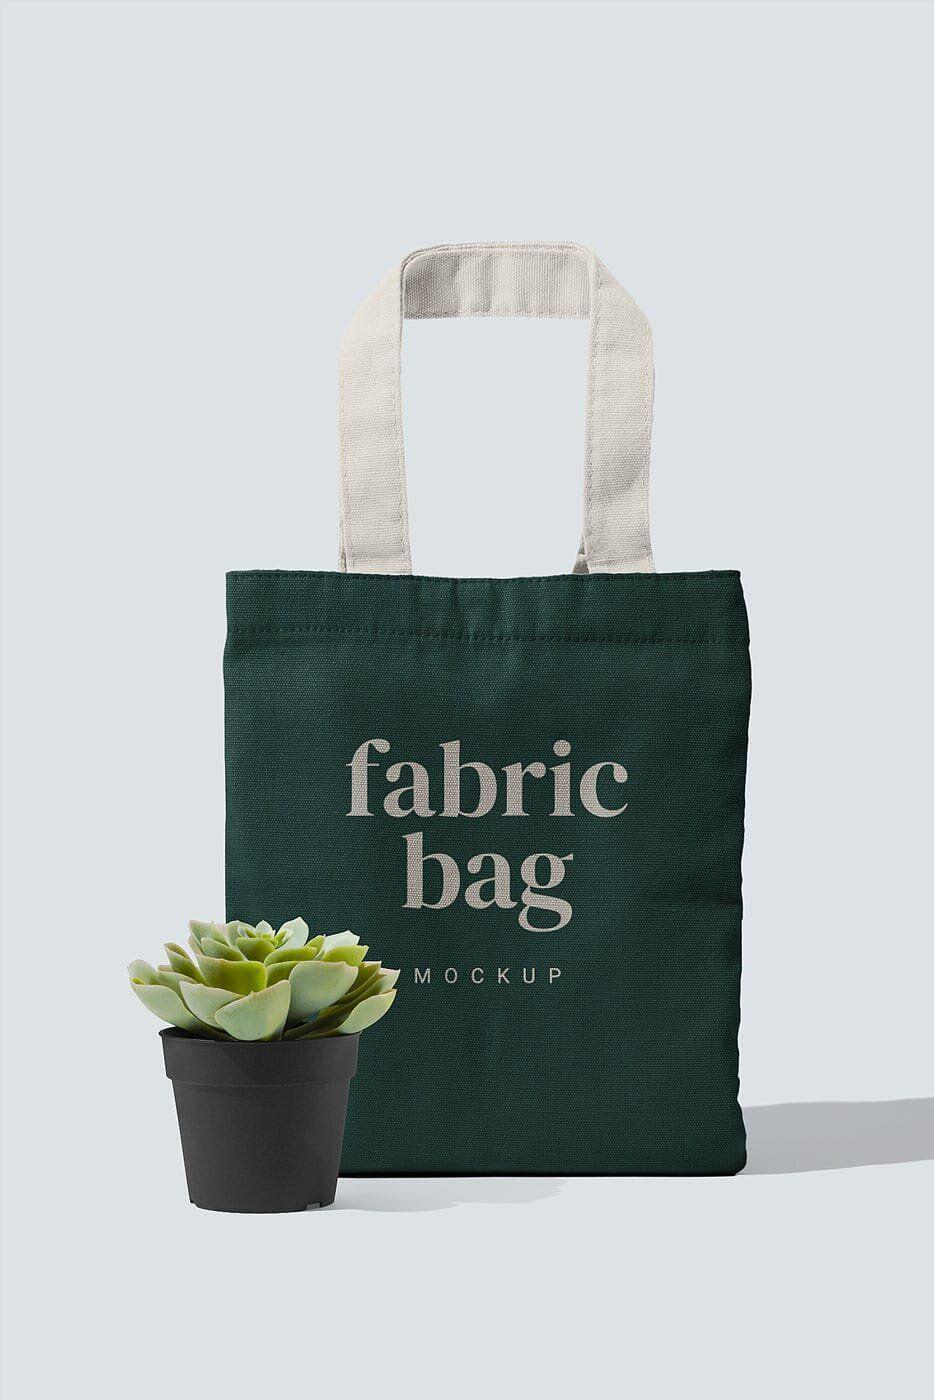 Download Online Mockup Templates Bag Mockup Fabric Bag Bags